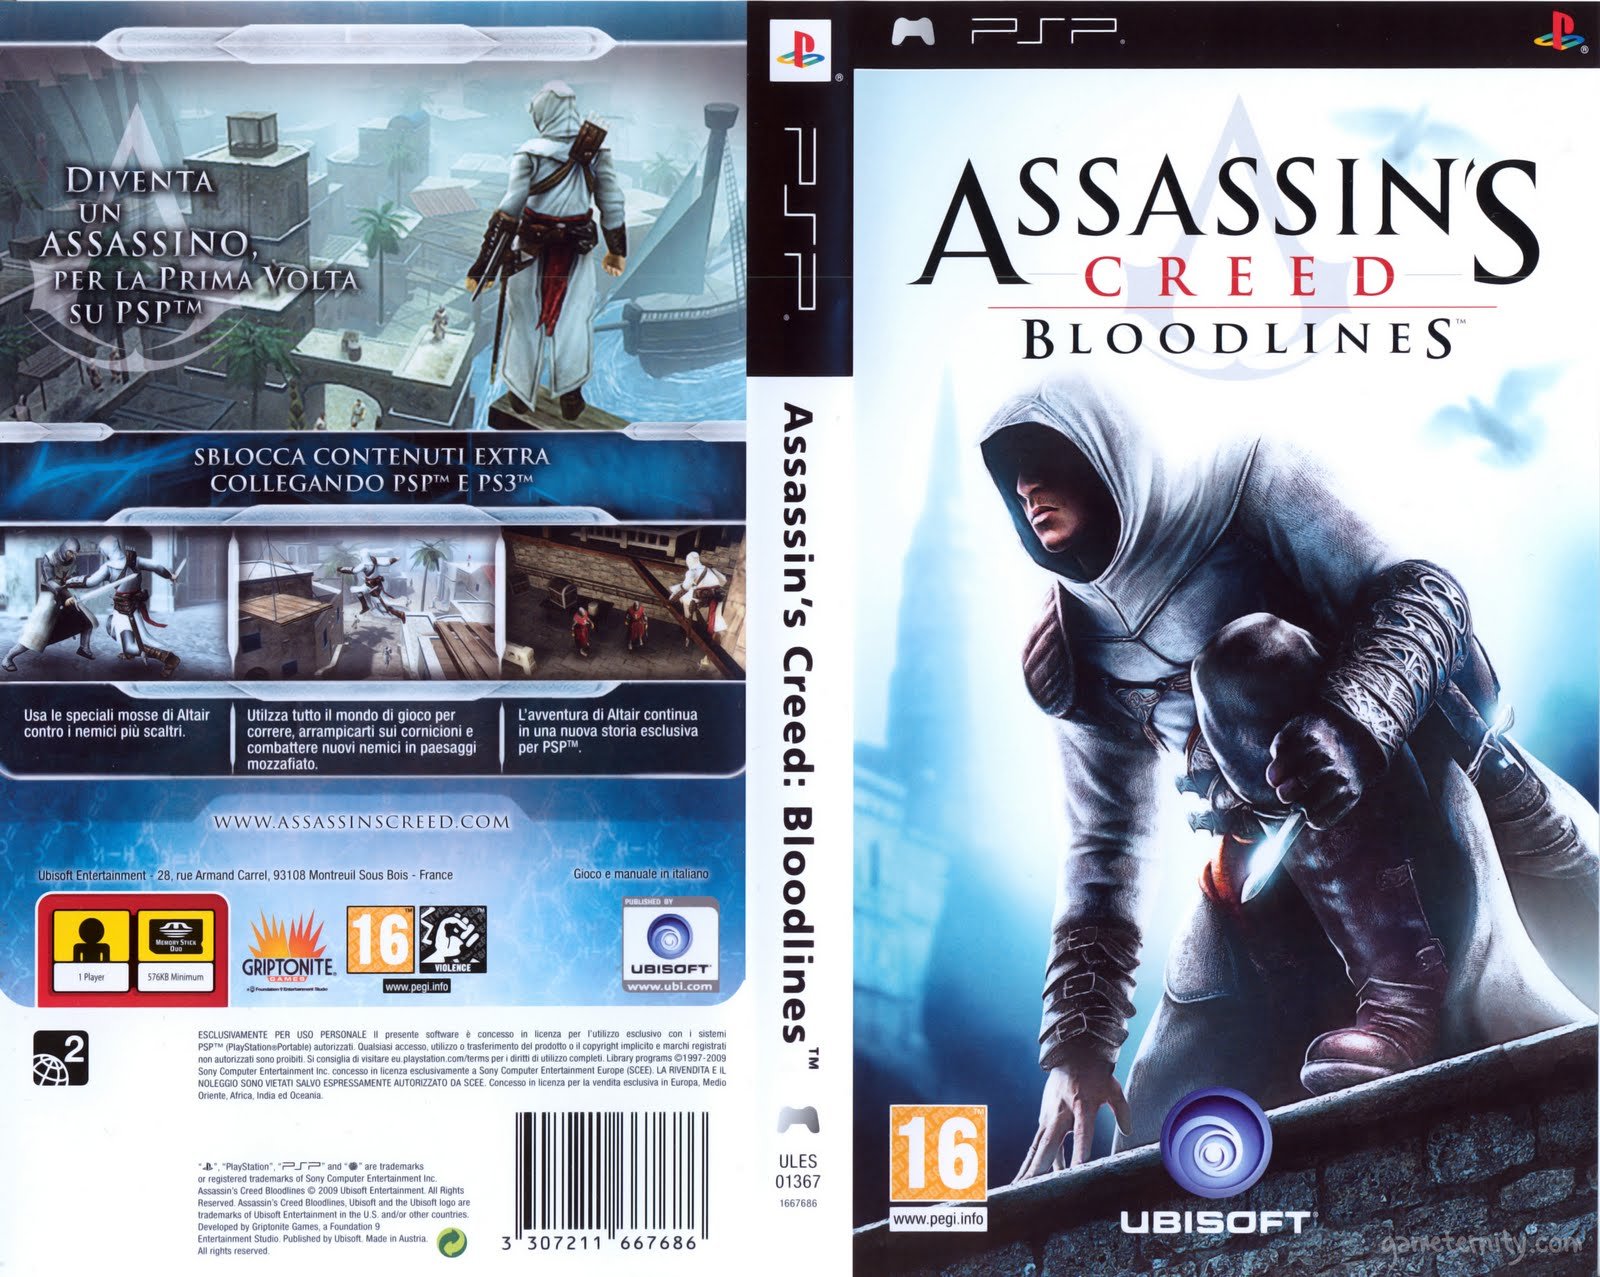 Ps Vita Games Assassins Creed Games Wallpaper Ps3 Psp Xbox